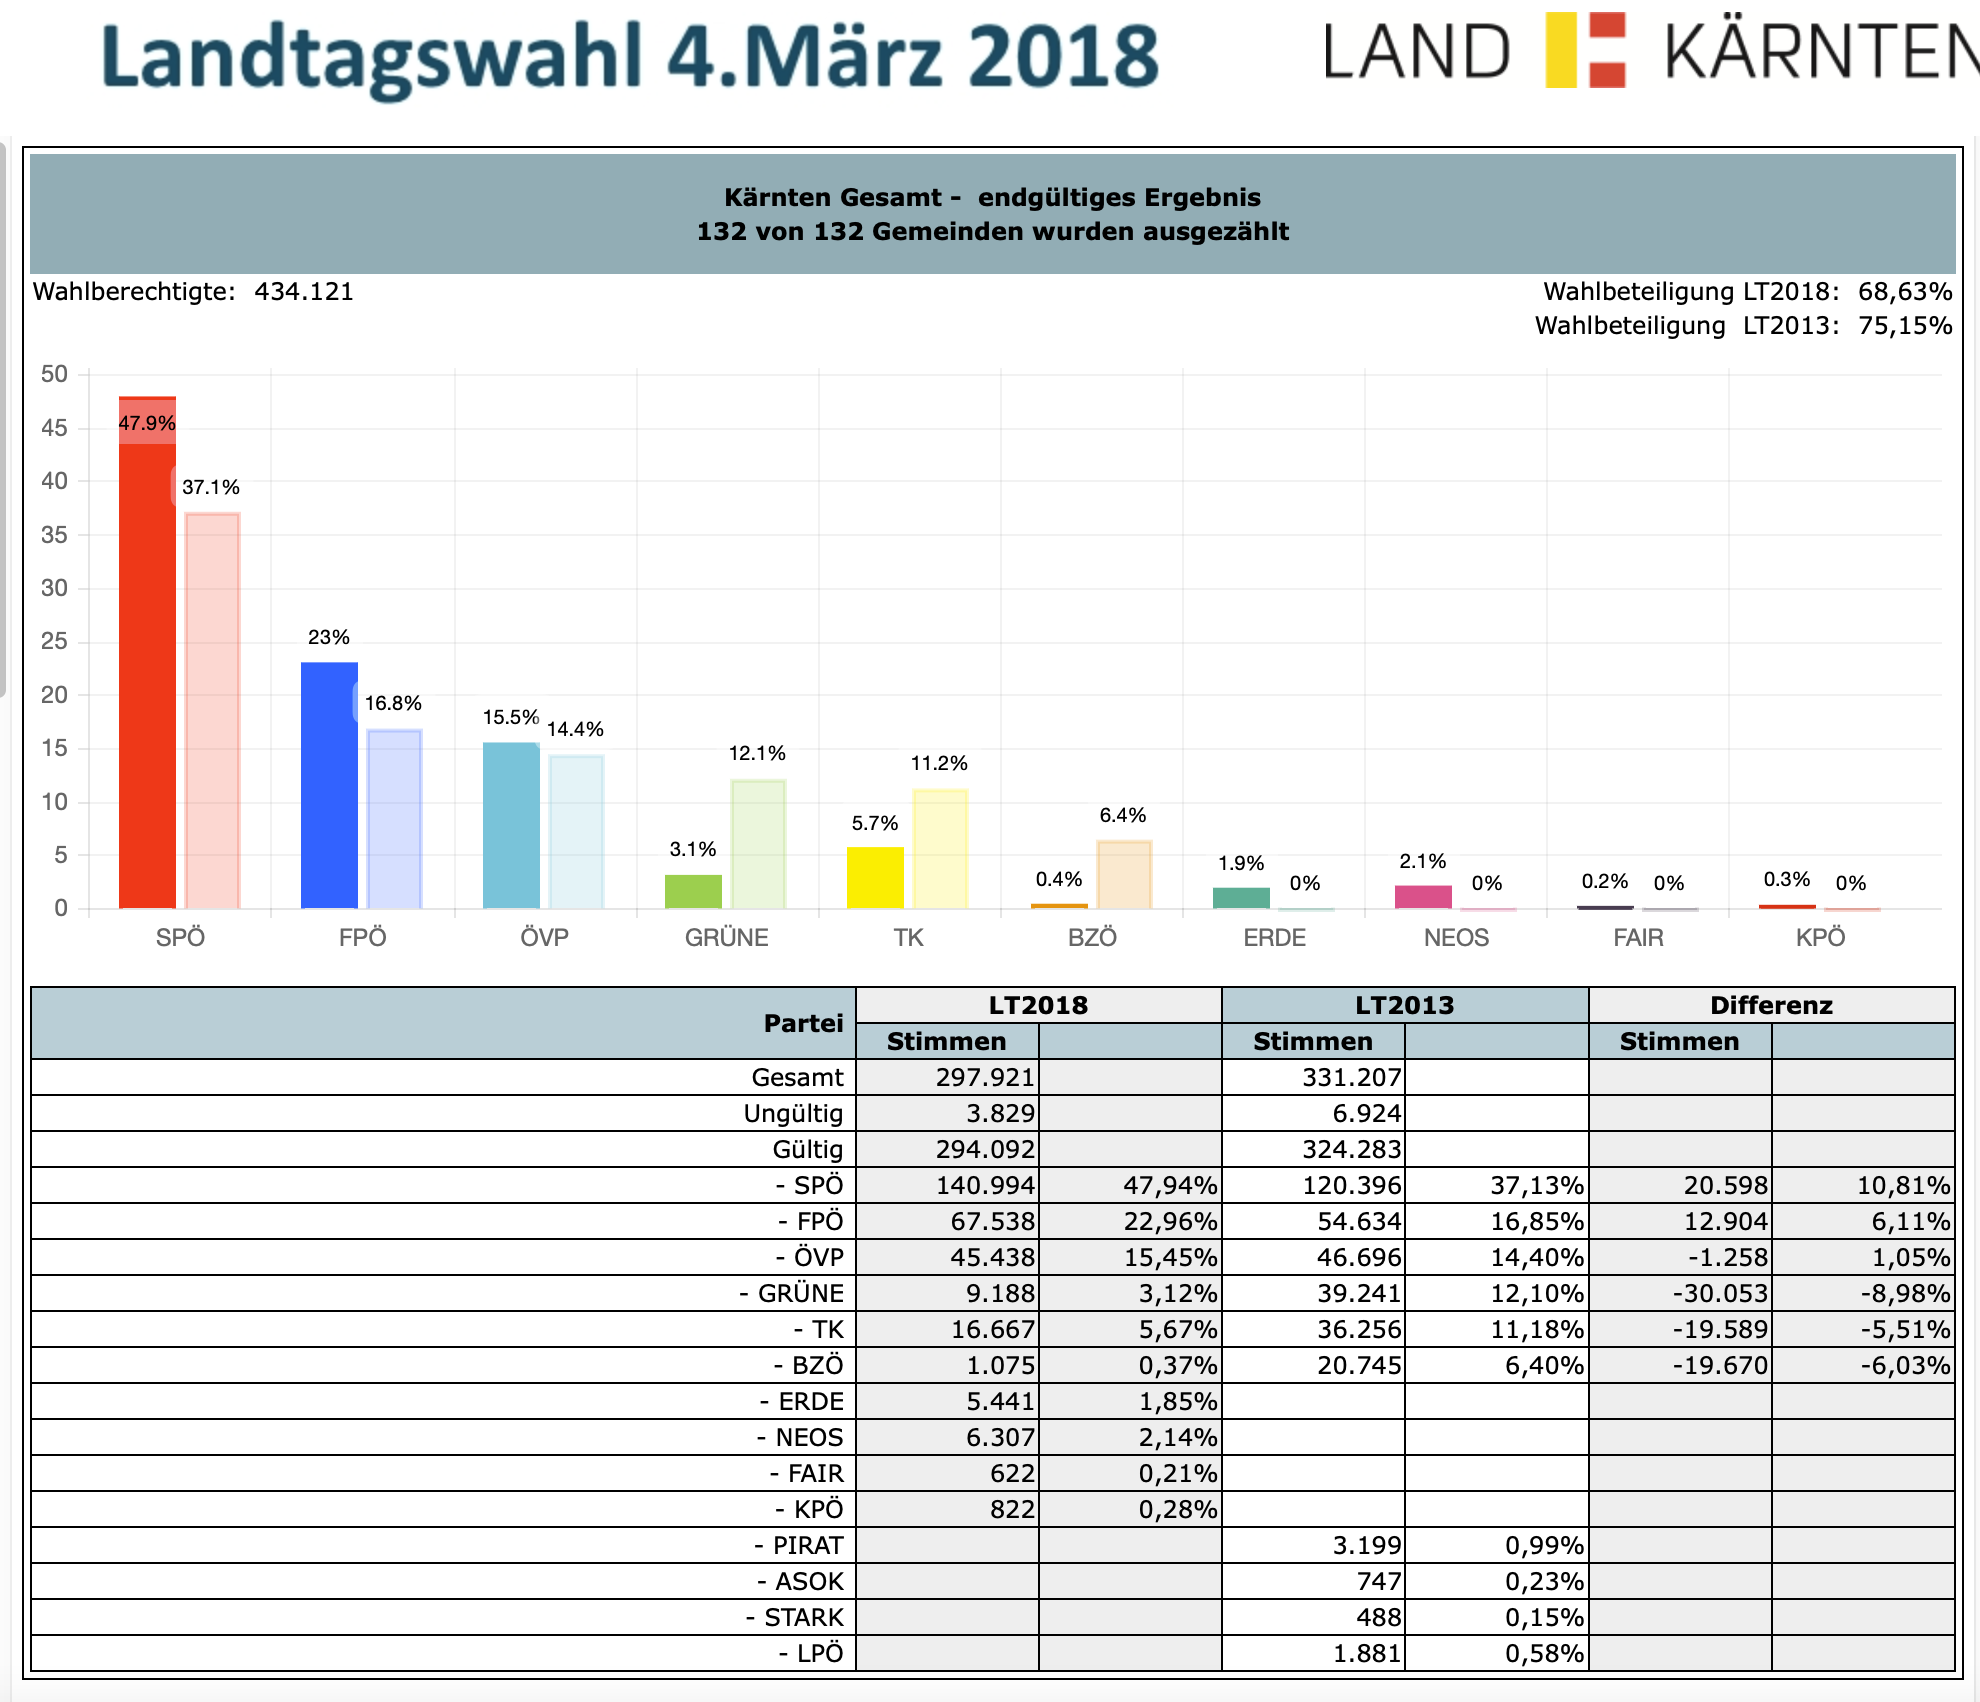 Landtagswahlen 2018 in Kärnten